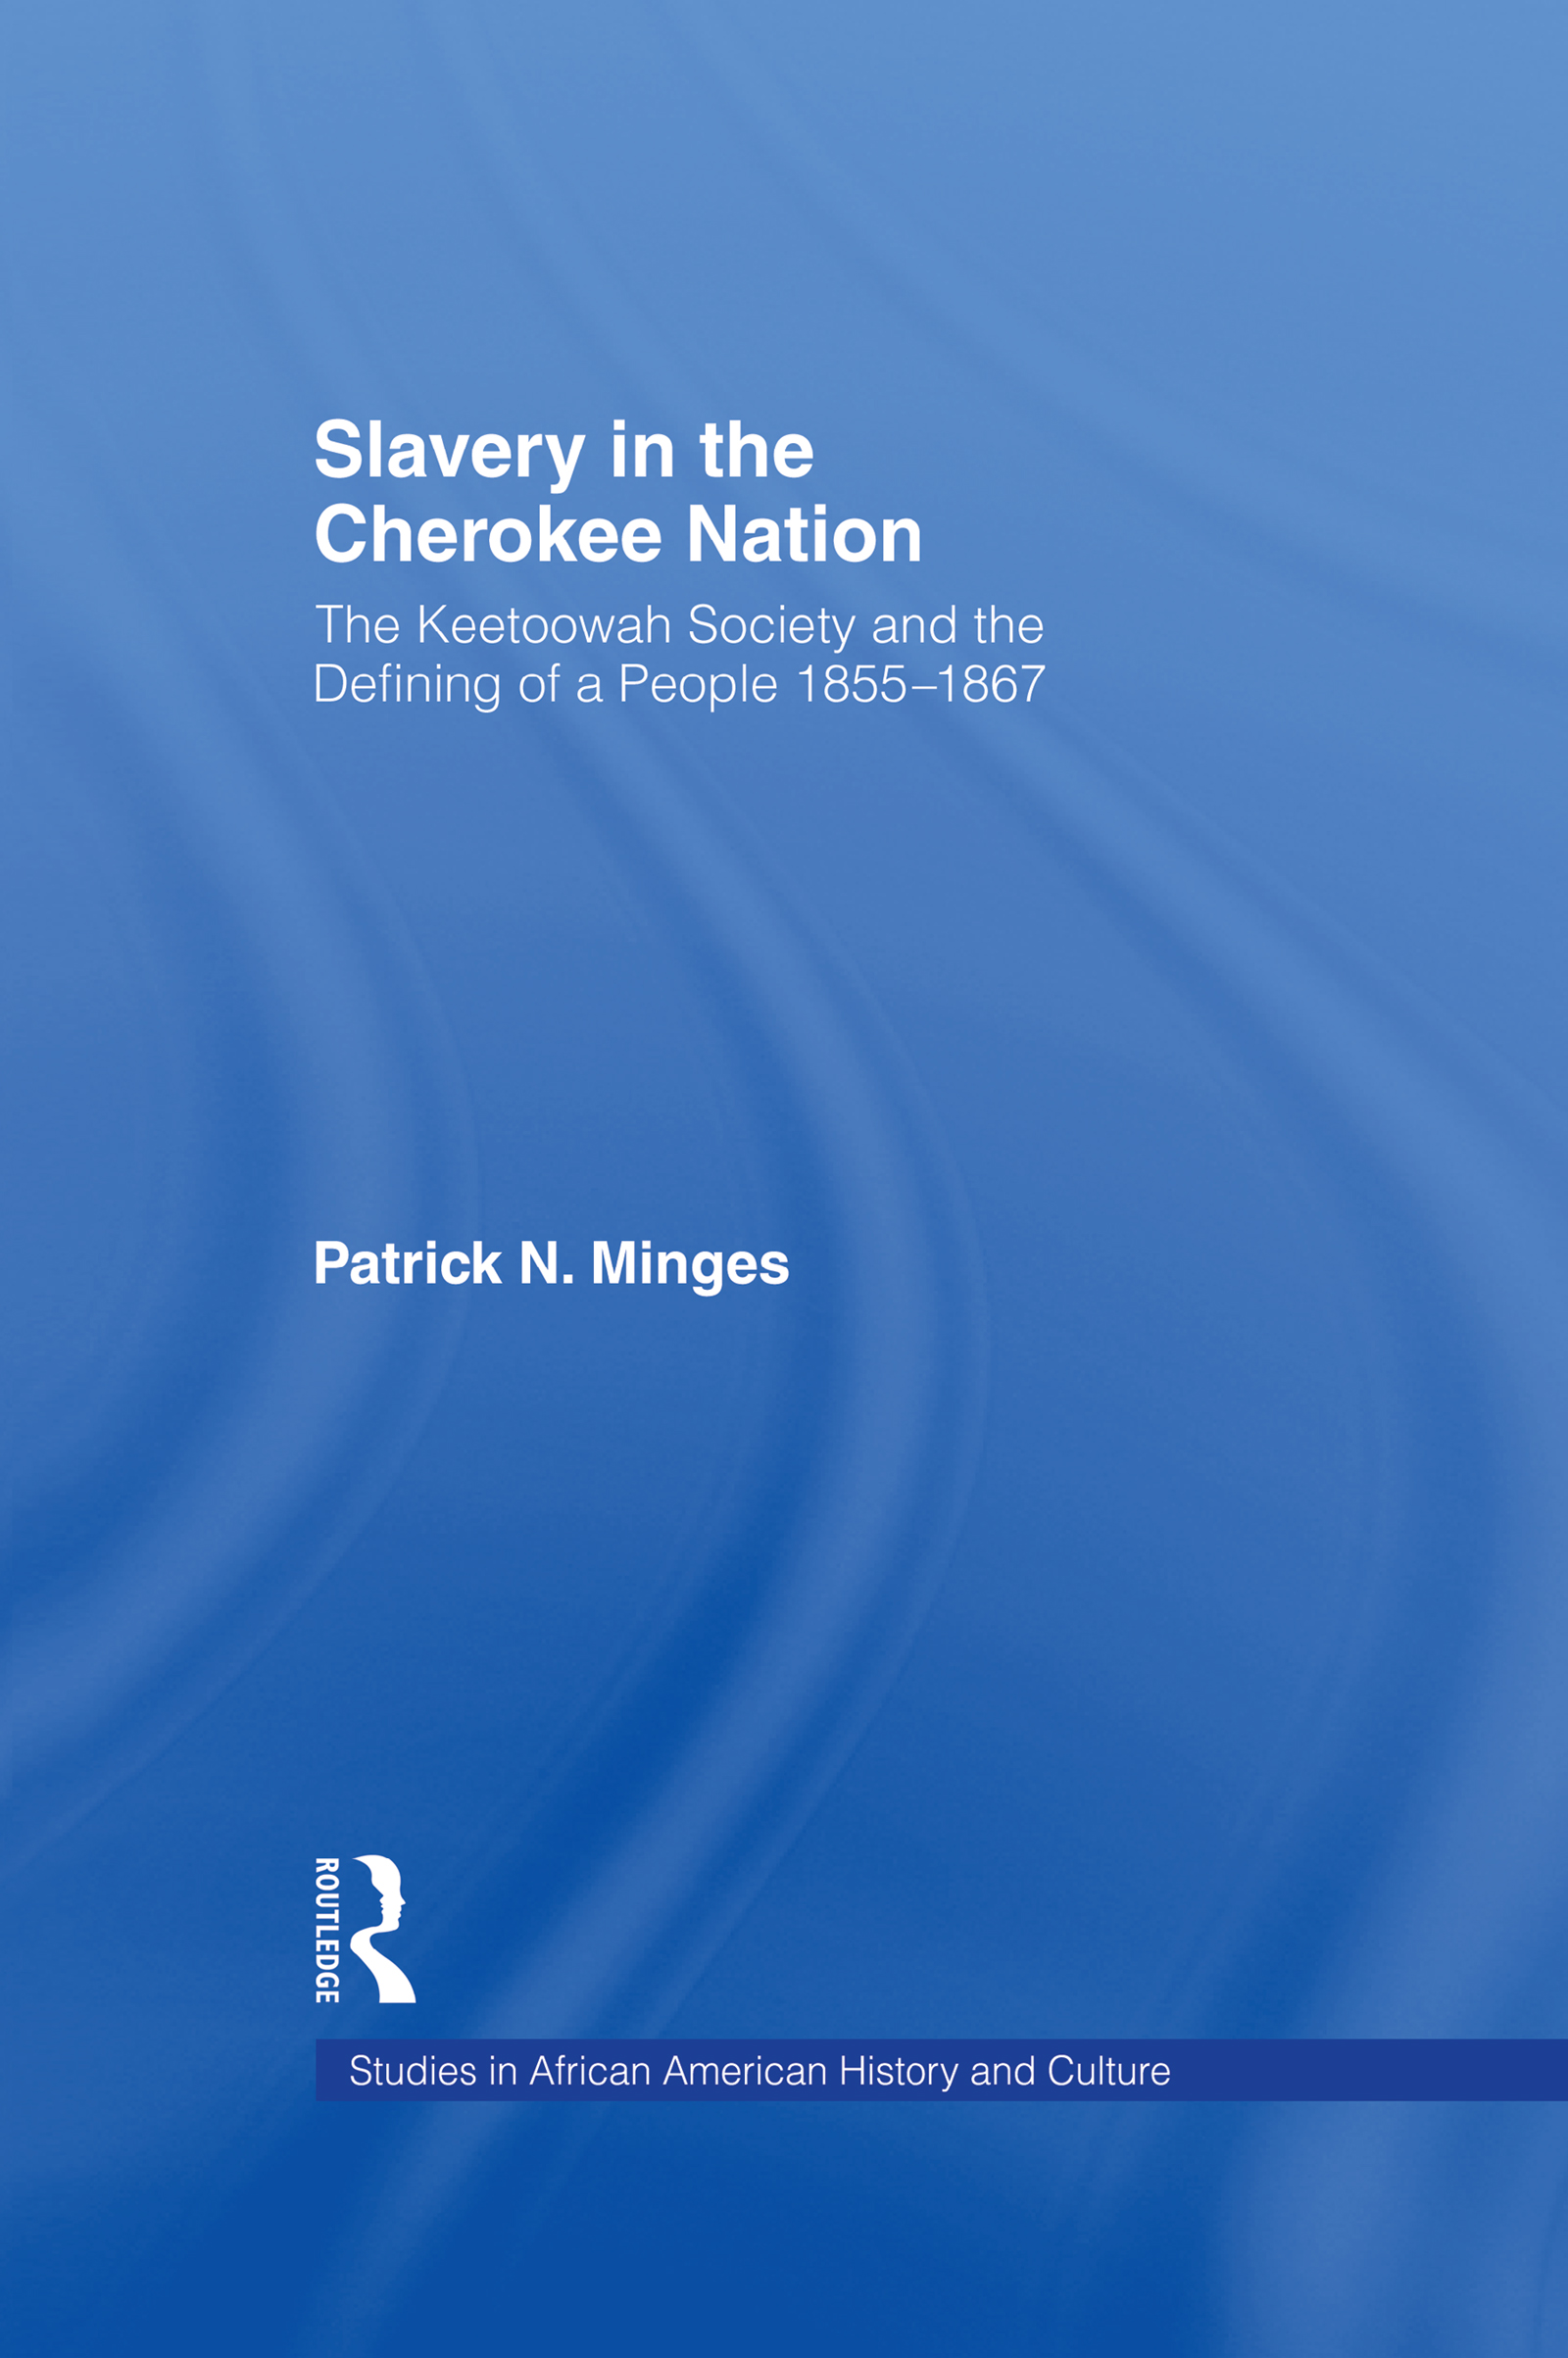 Slavery in the Cherokee Nation